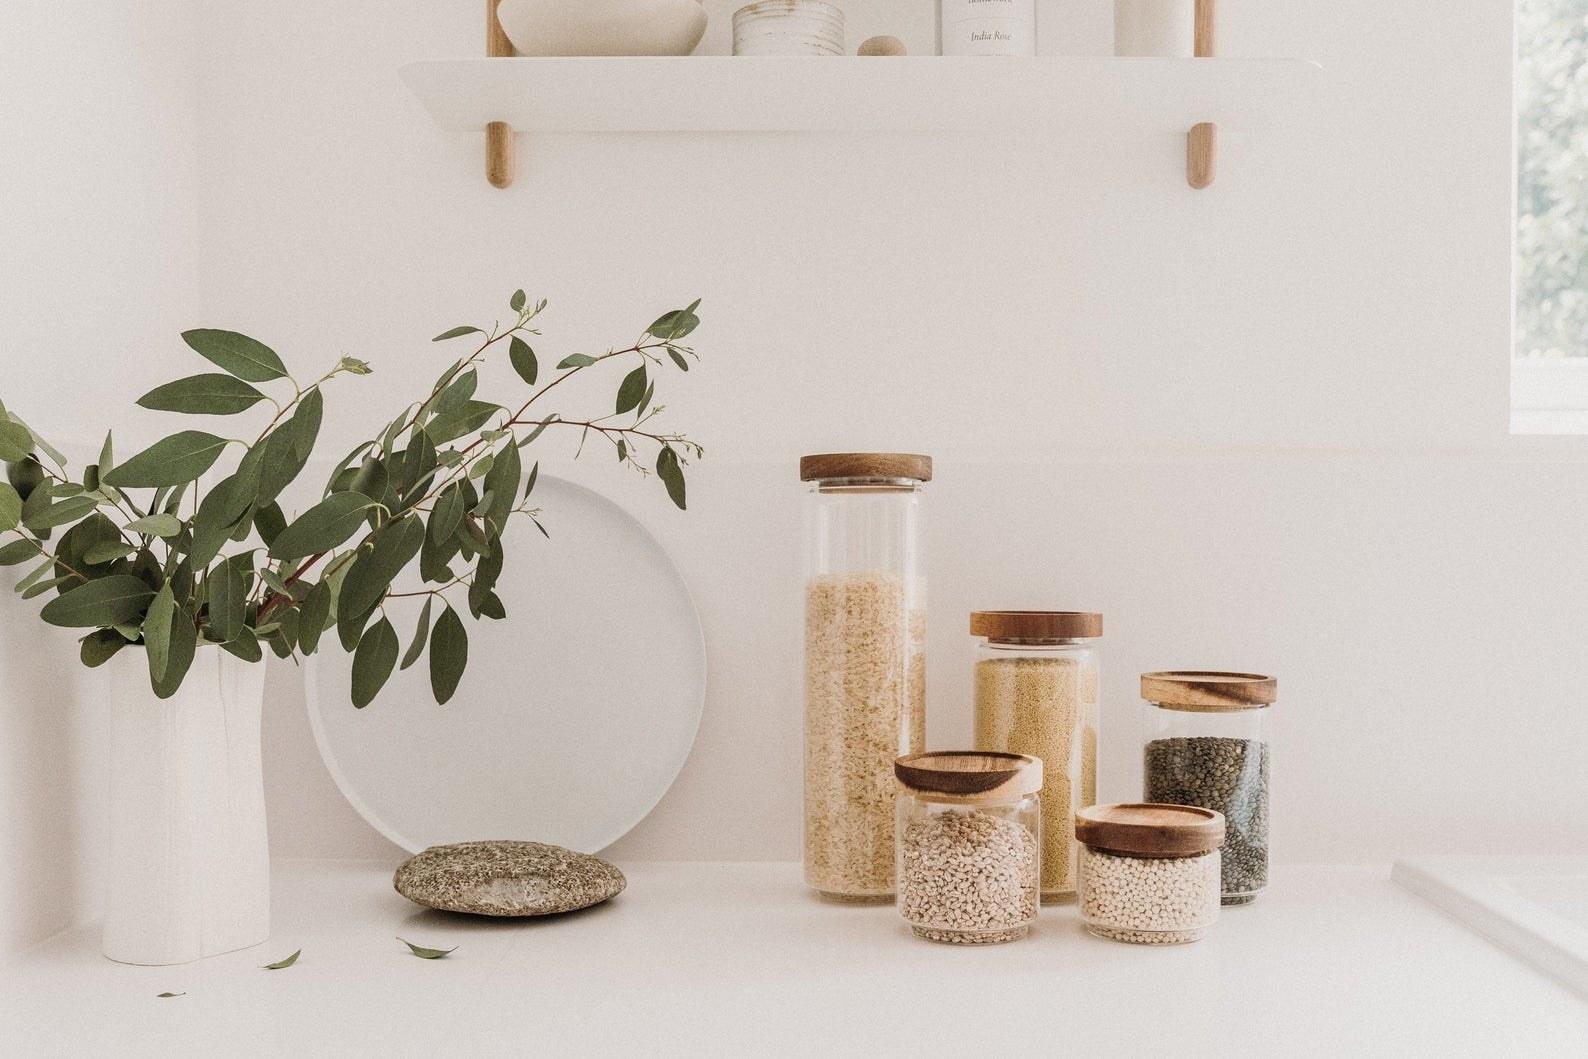 eco glass jars with ingredients inside them